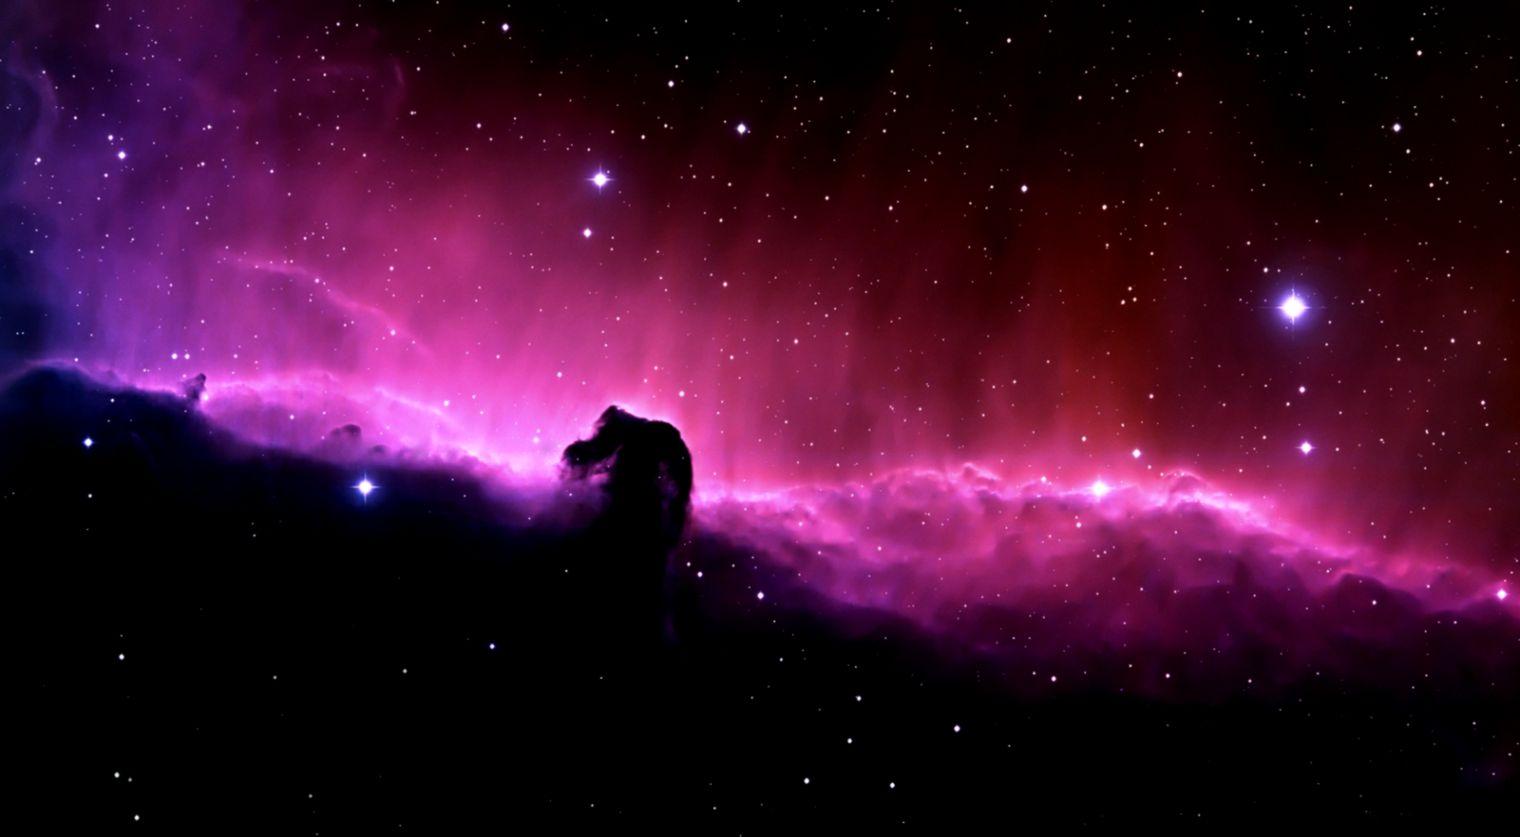 Hd Space Wallpaper Hd Backgrounds